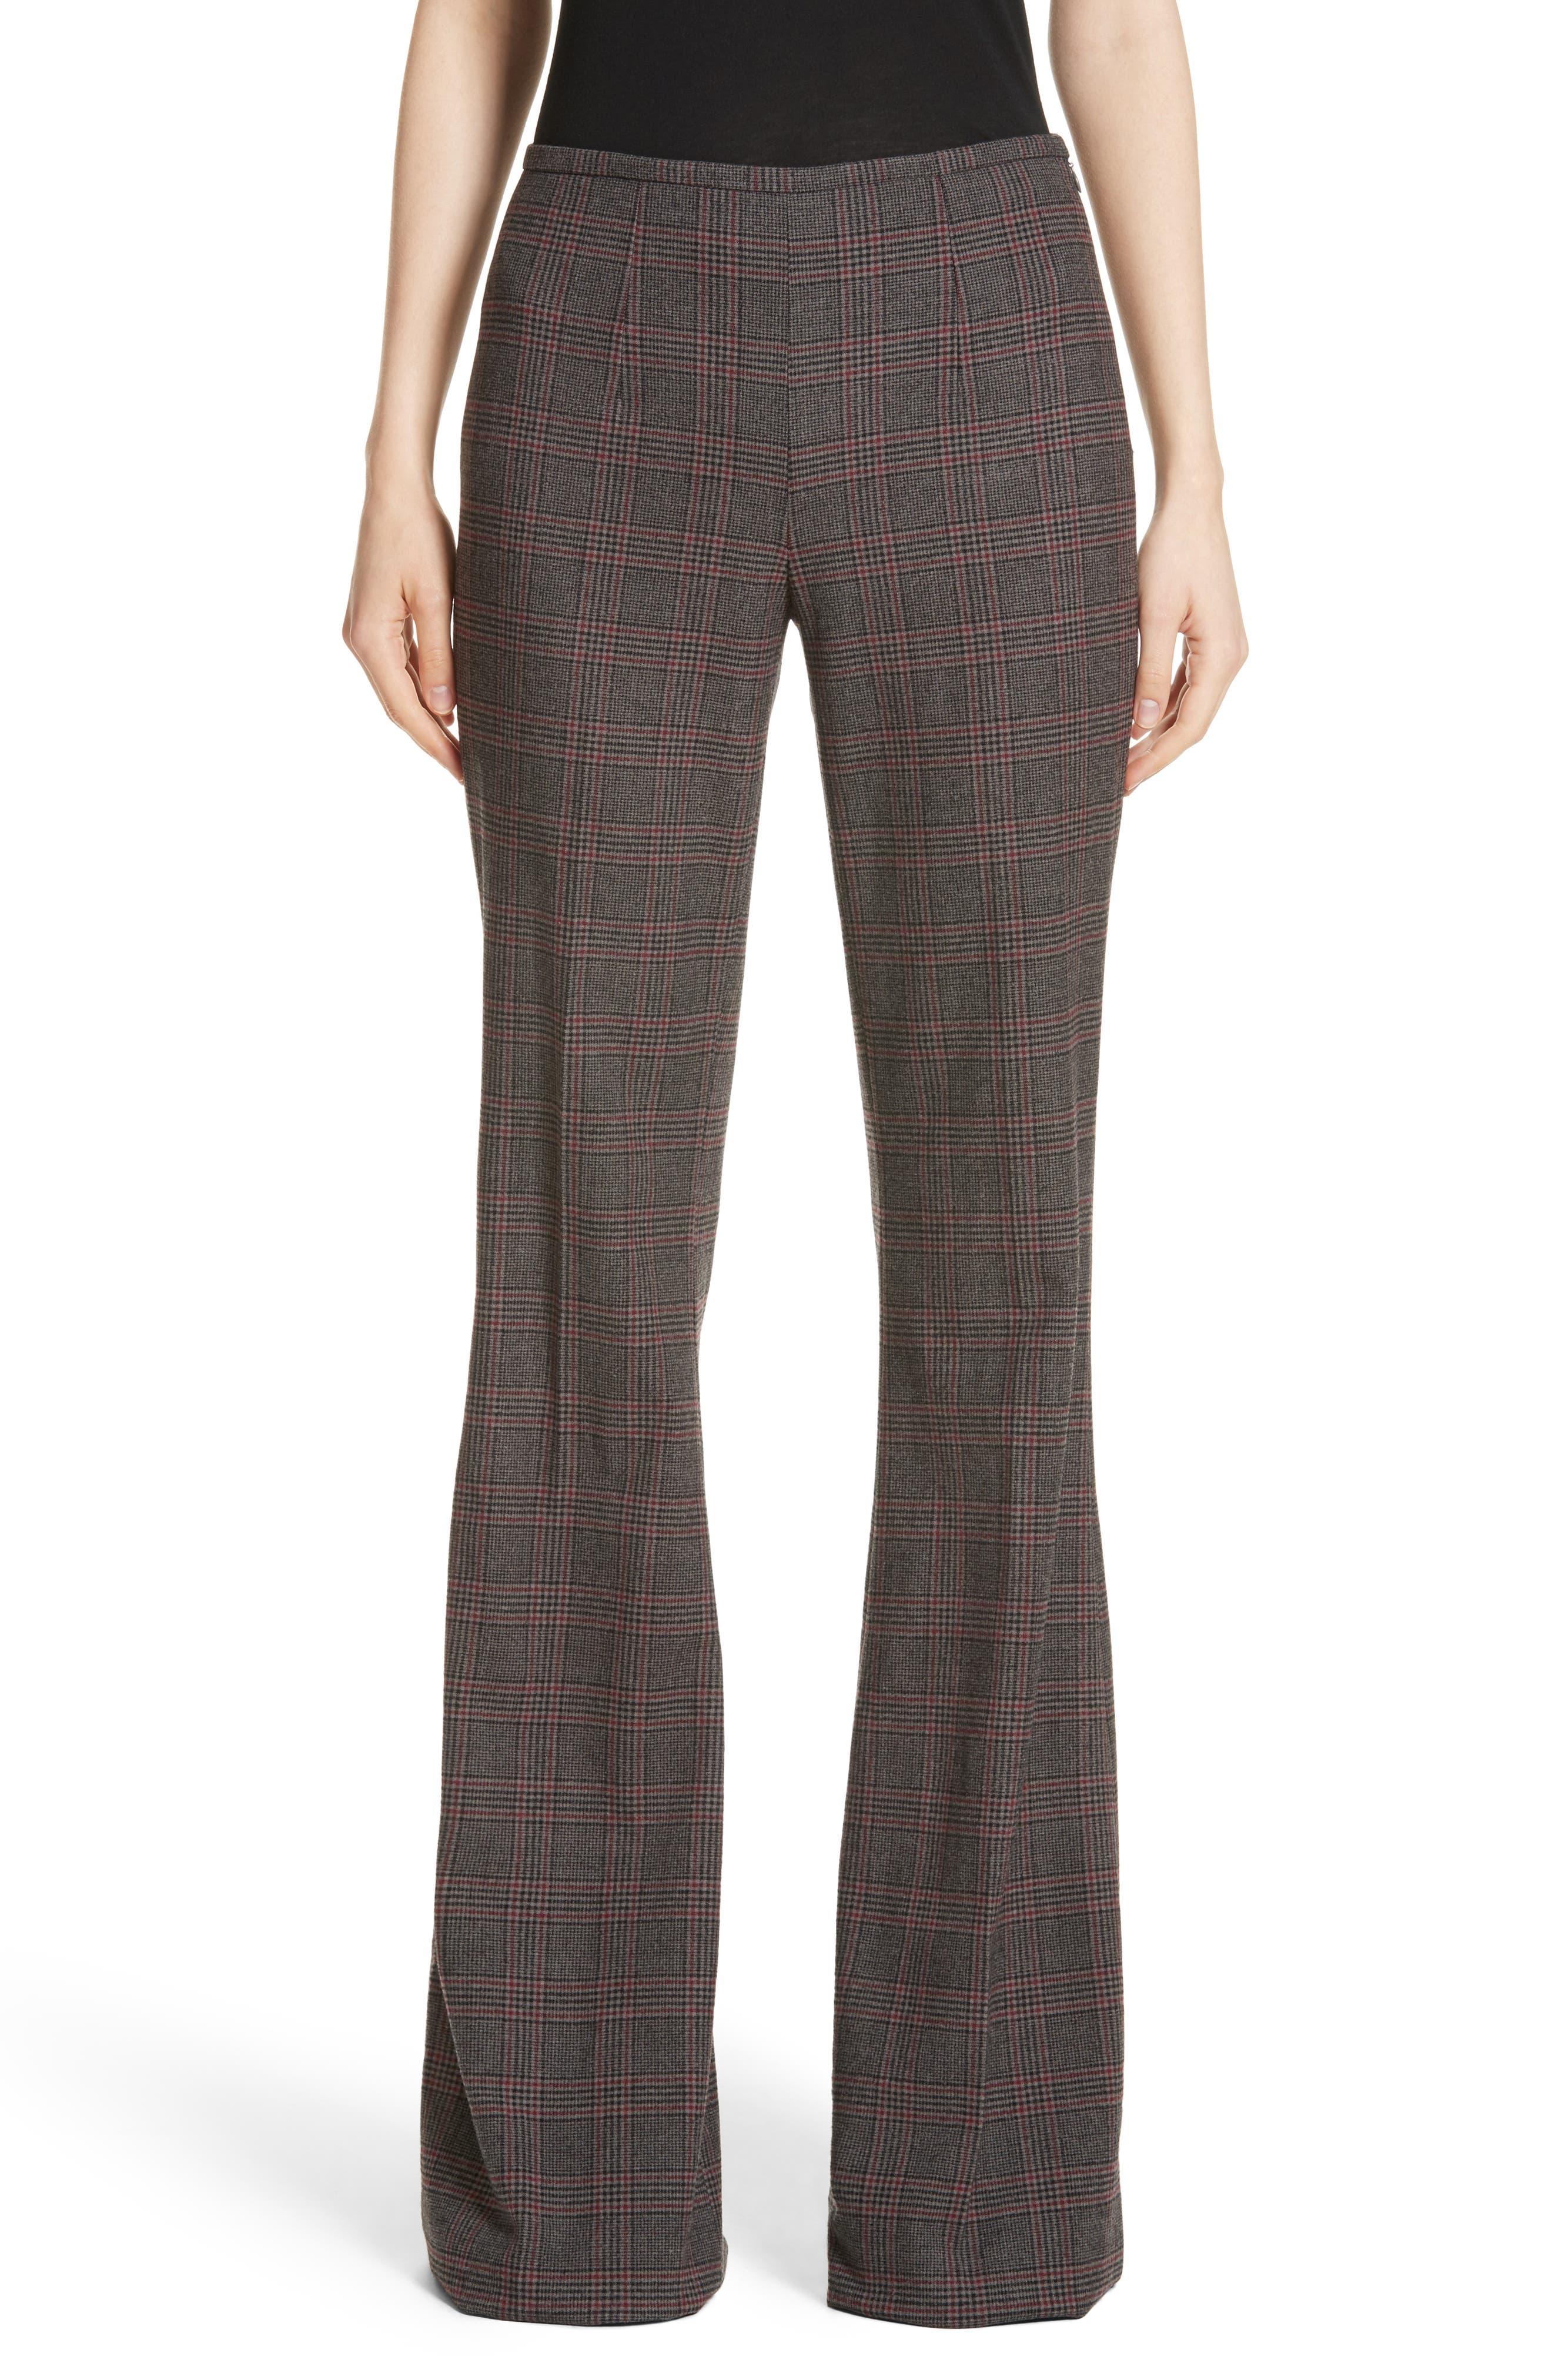 MICHAEL KORS,                             Plaid Stretch Wool Flannel Pants,                             Main thumbnail 1, color,                             034